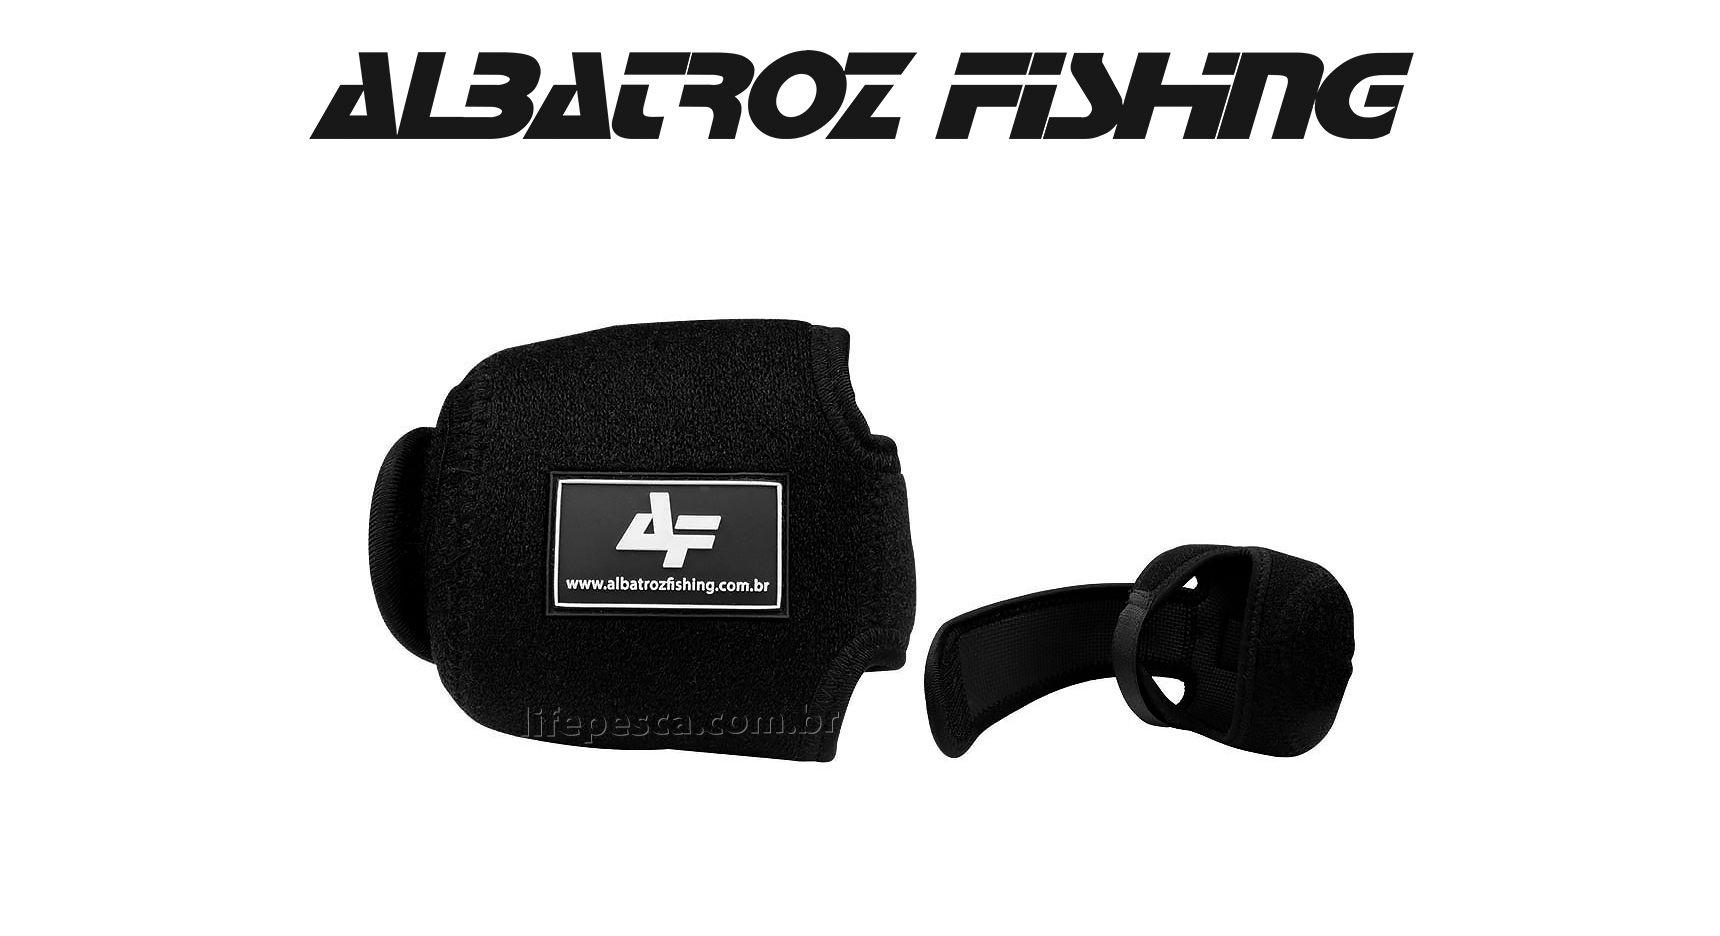 Capa Protecast Para Carretilha (Perfil Baixo) - Albatroz Fishing - RBC8-S